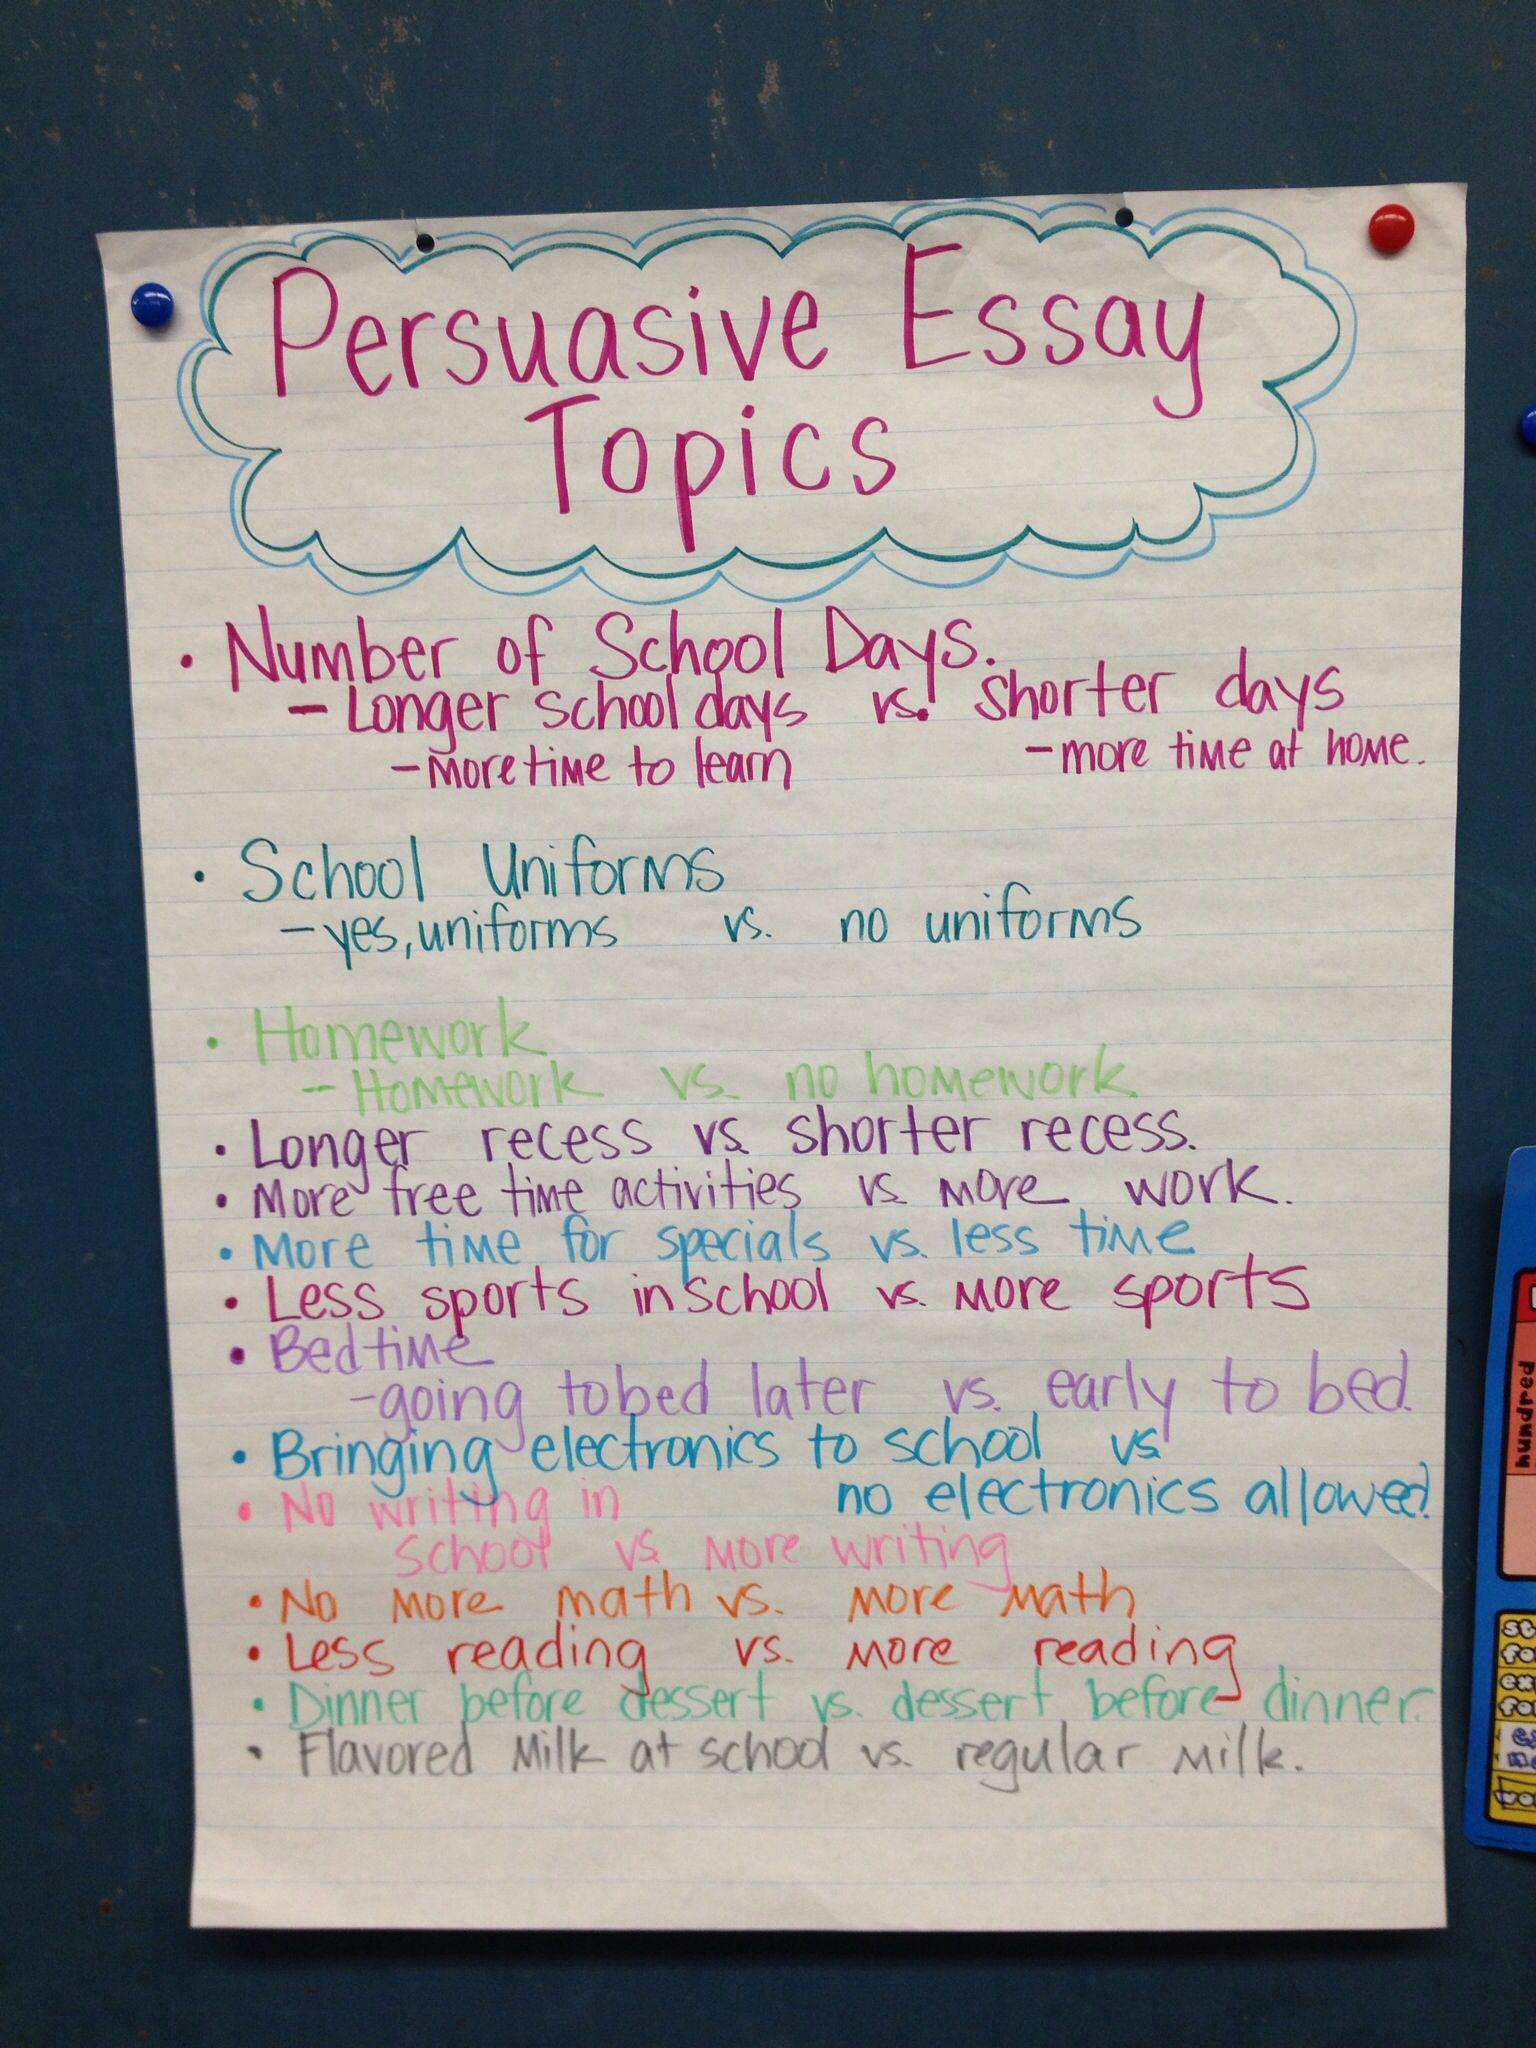 018 Topics For Persuasive Essay Example Formidable Essays High School 6th Grade 3rd Full